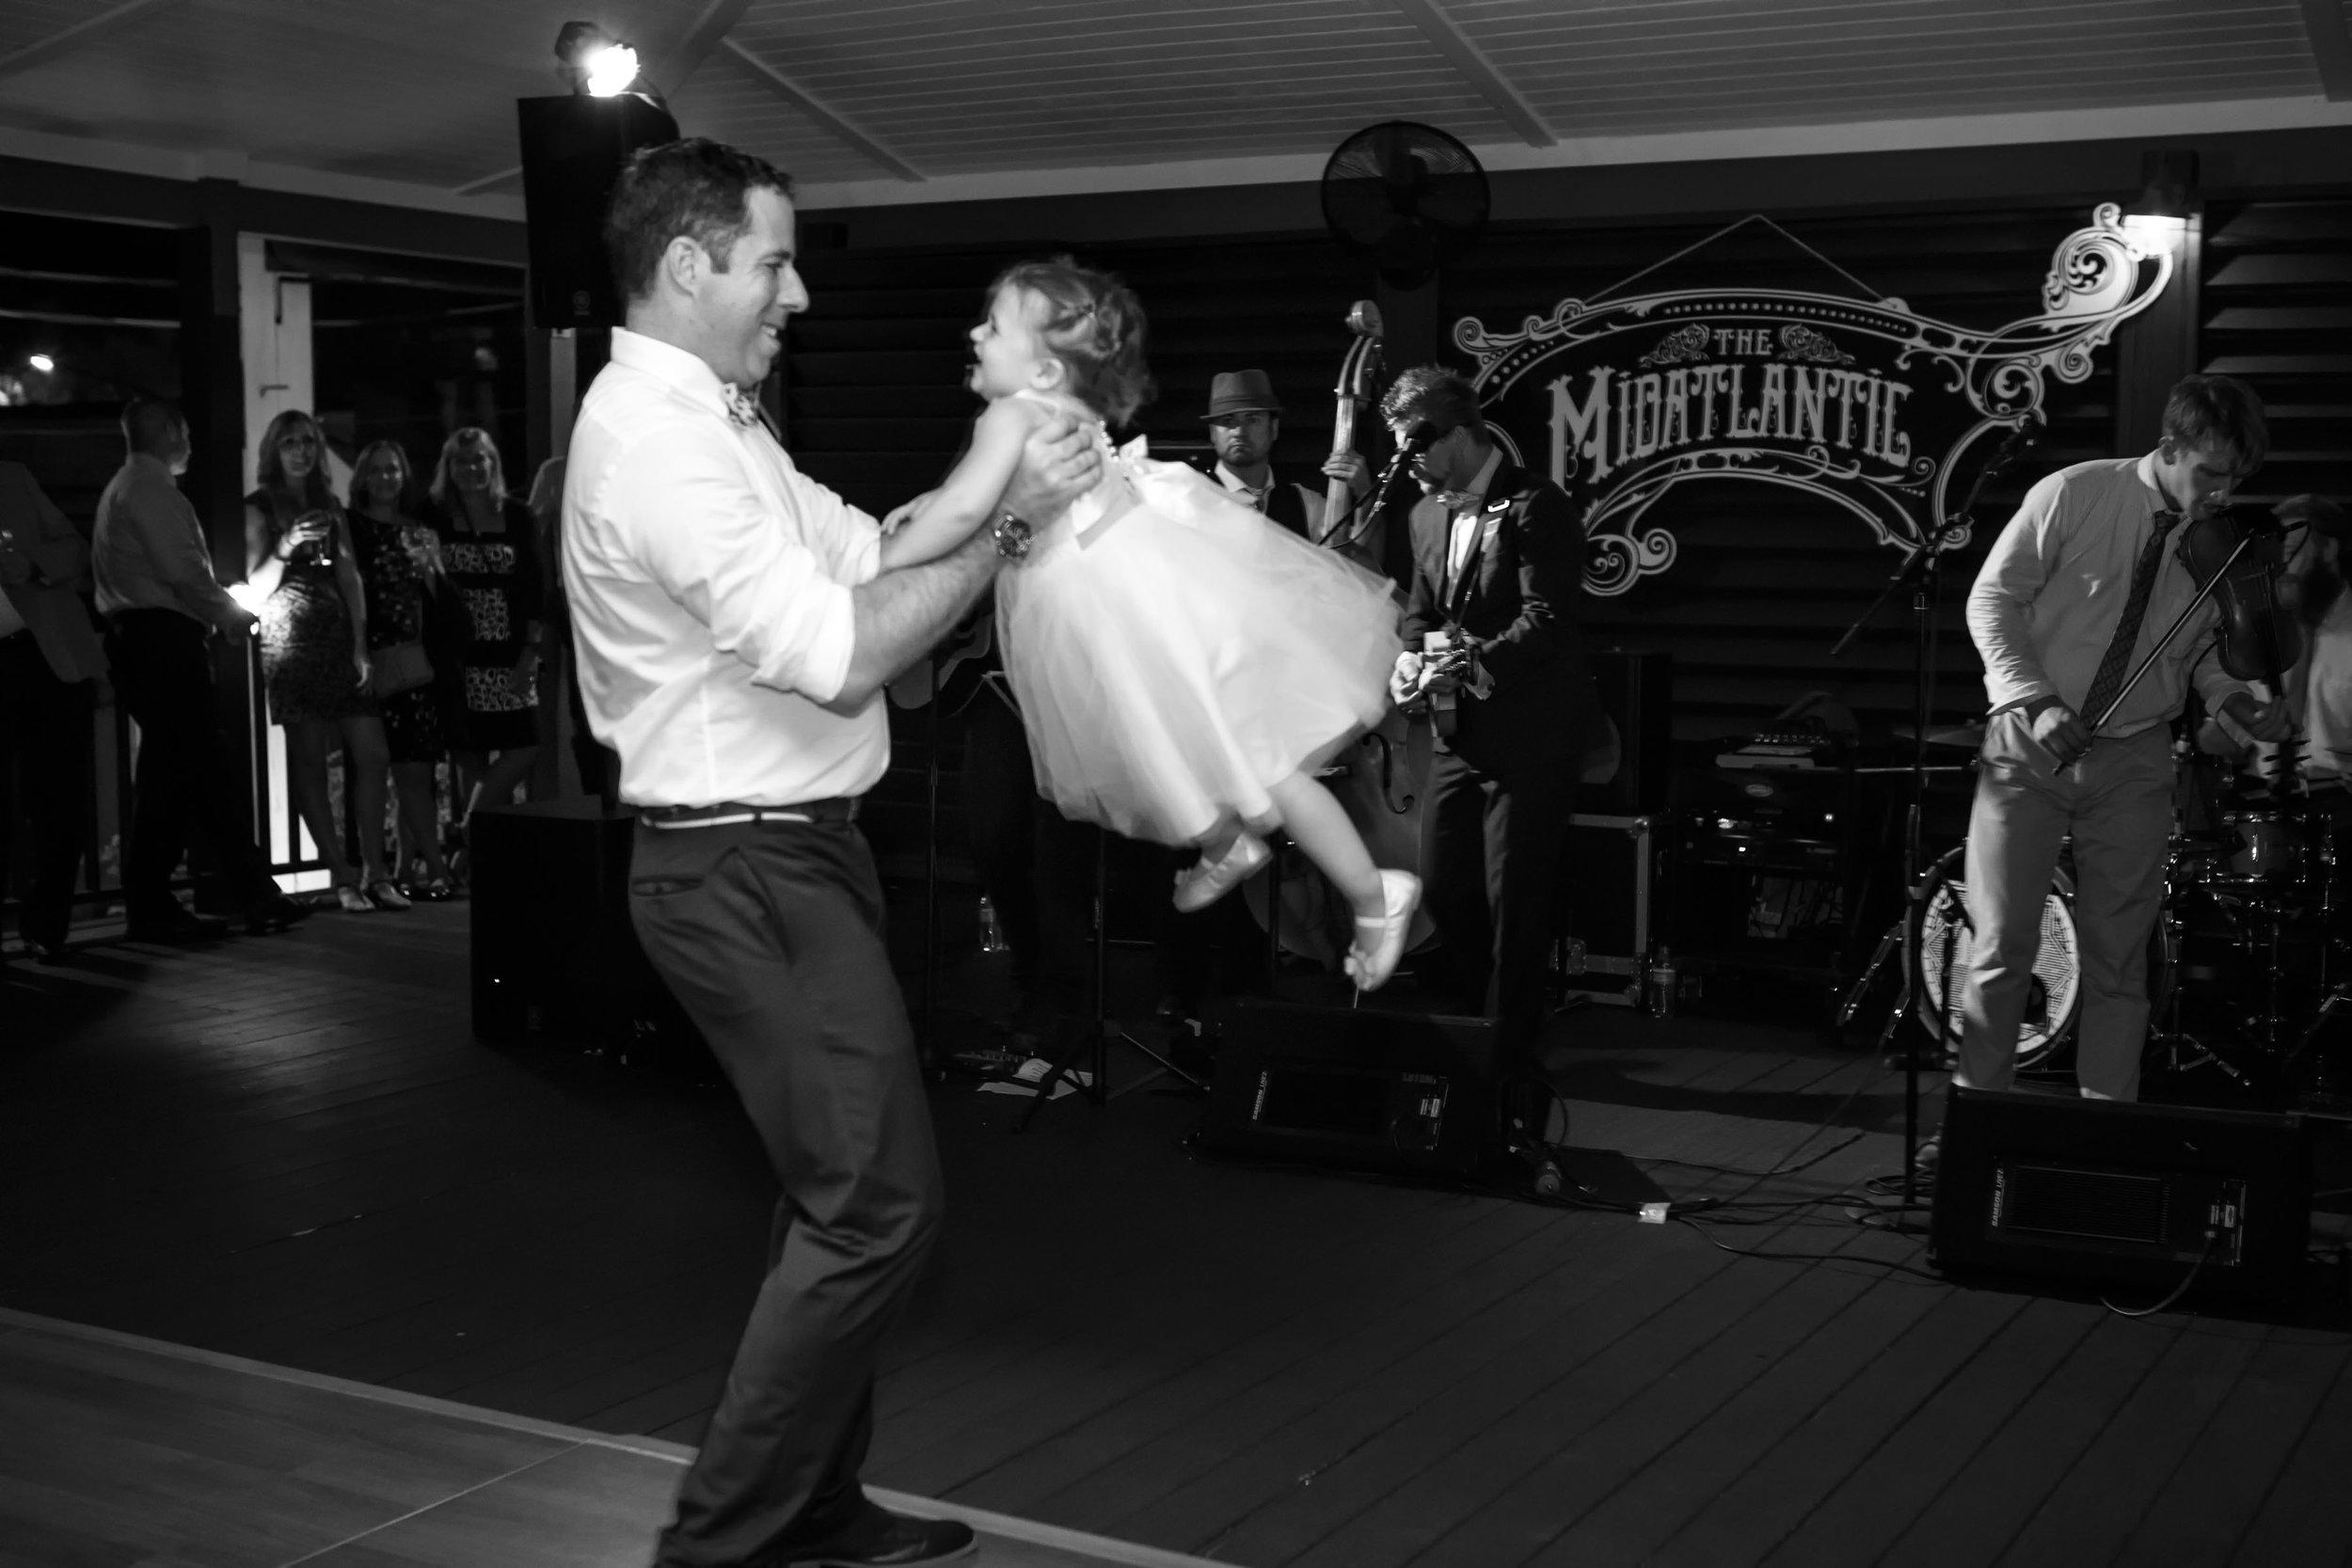 128-South-Wedding-Wilmington-NC-Photographer-Reception-179.jpg